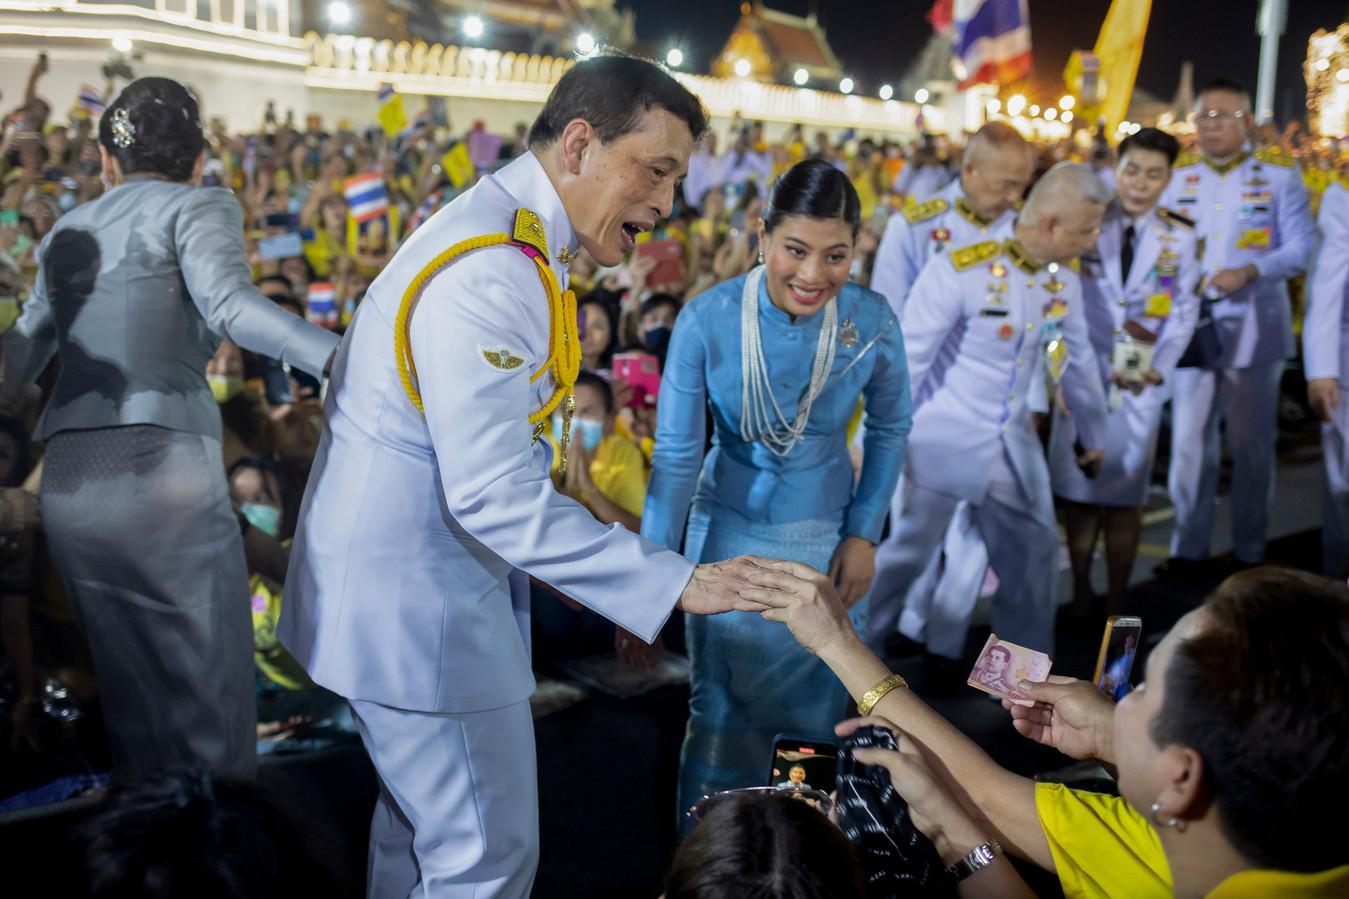 Prinses Sirivannavari Nariratana en haar vader tijdens een event in Bangkok.